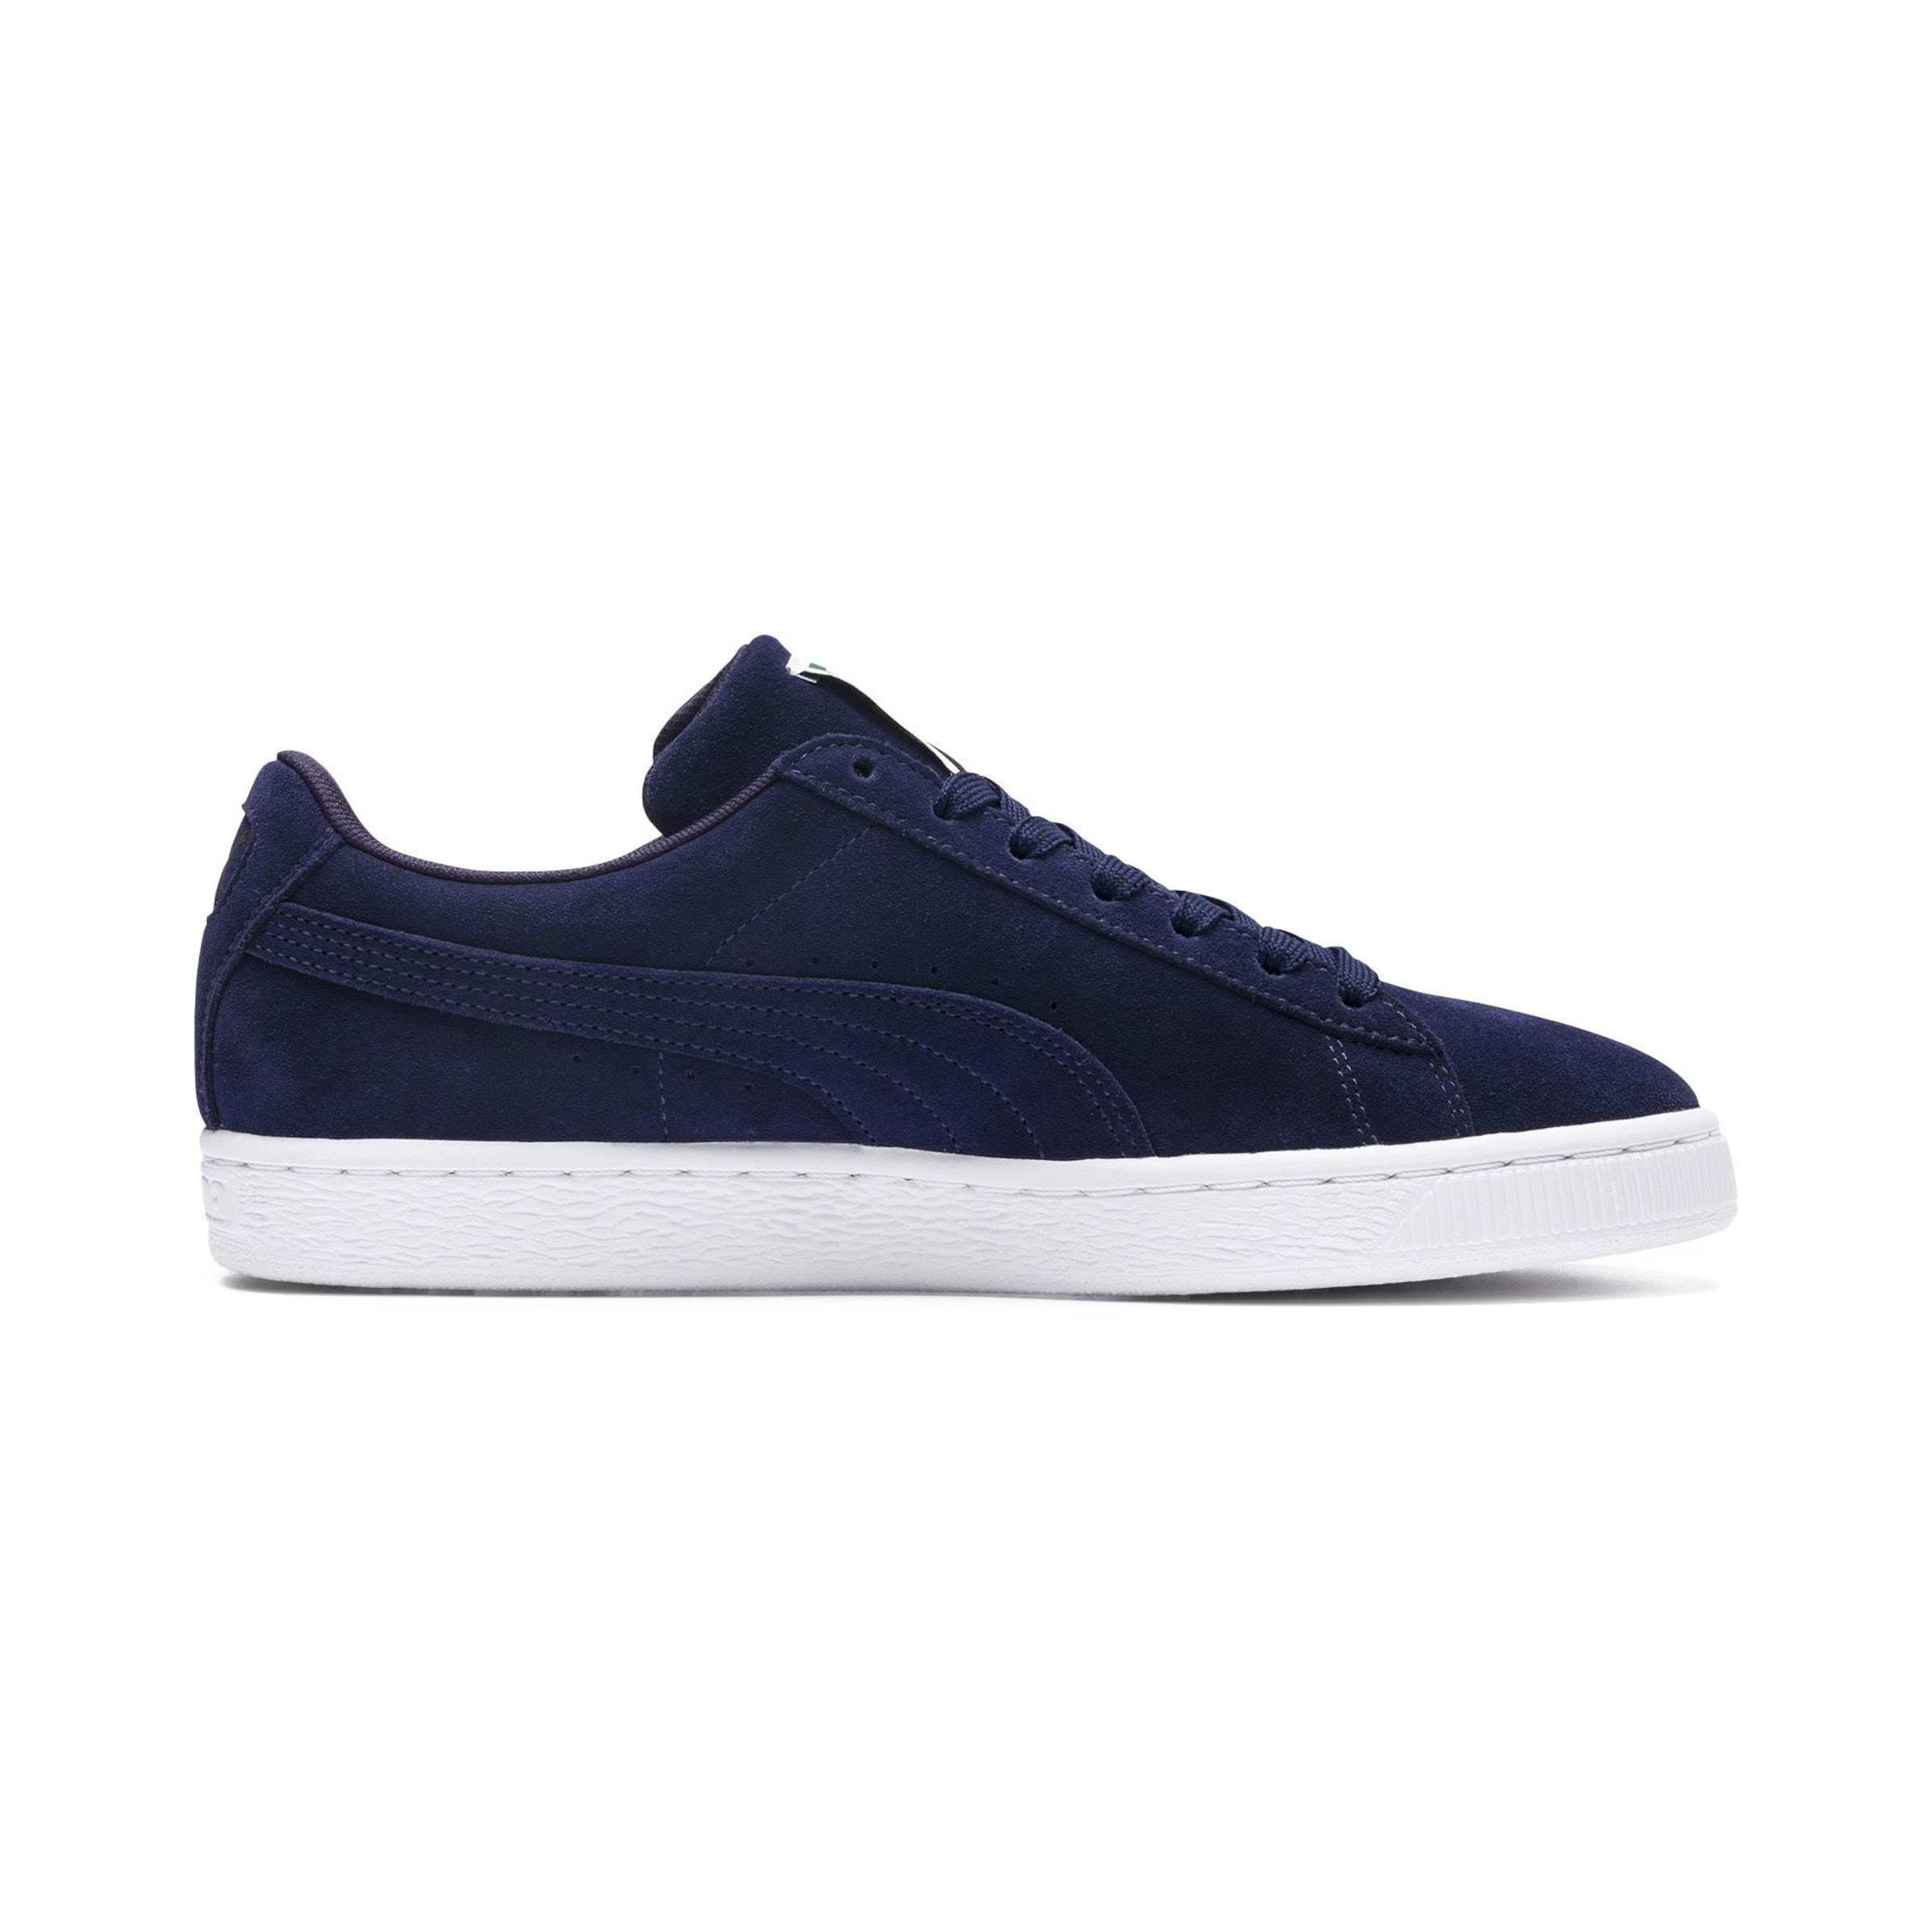 Puma Navy ClassicSneaker In Suede 8OmNv0wn